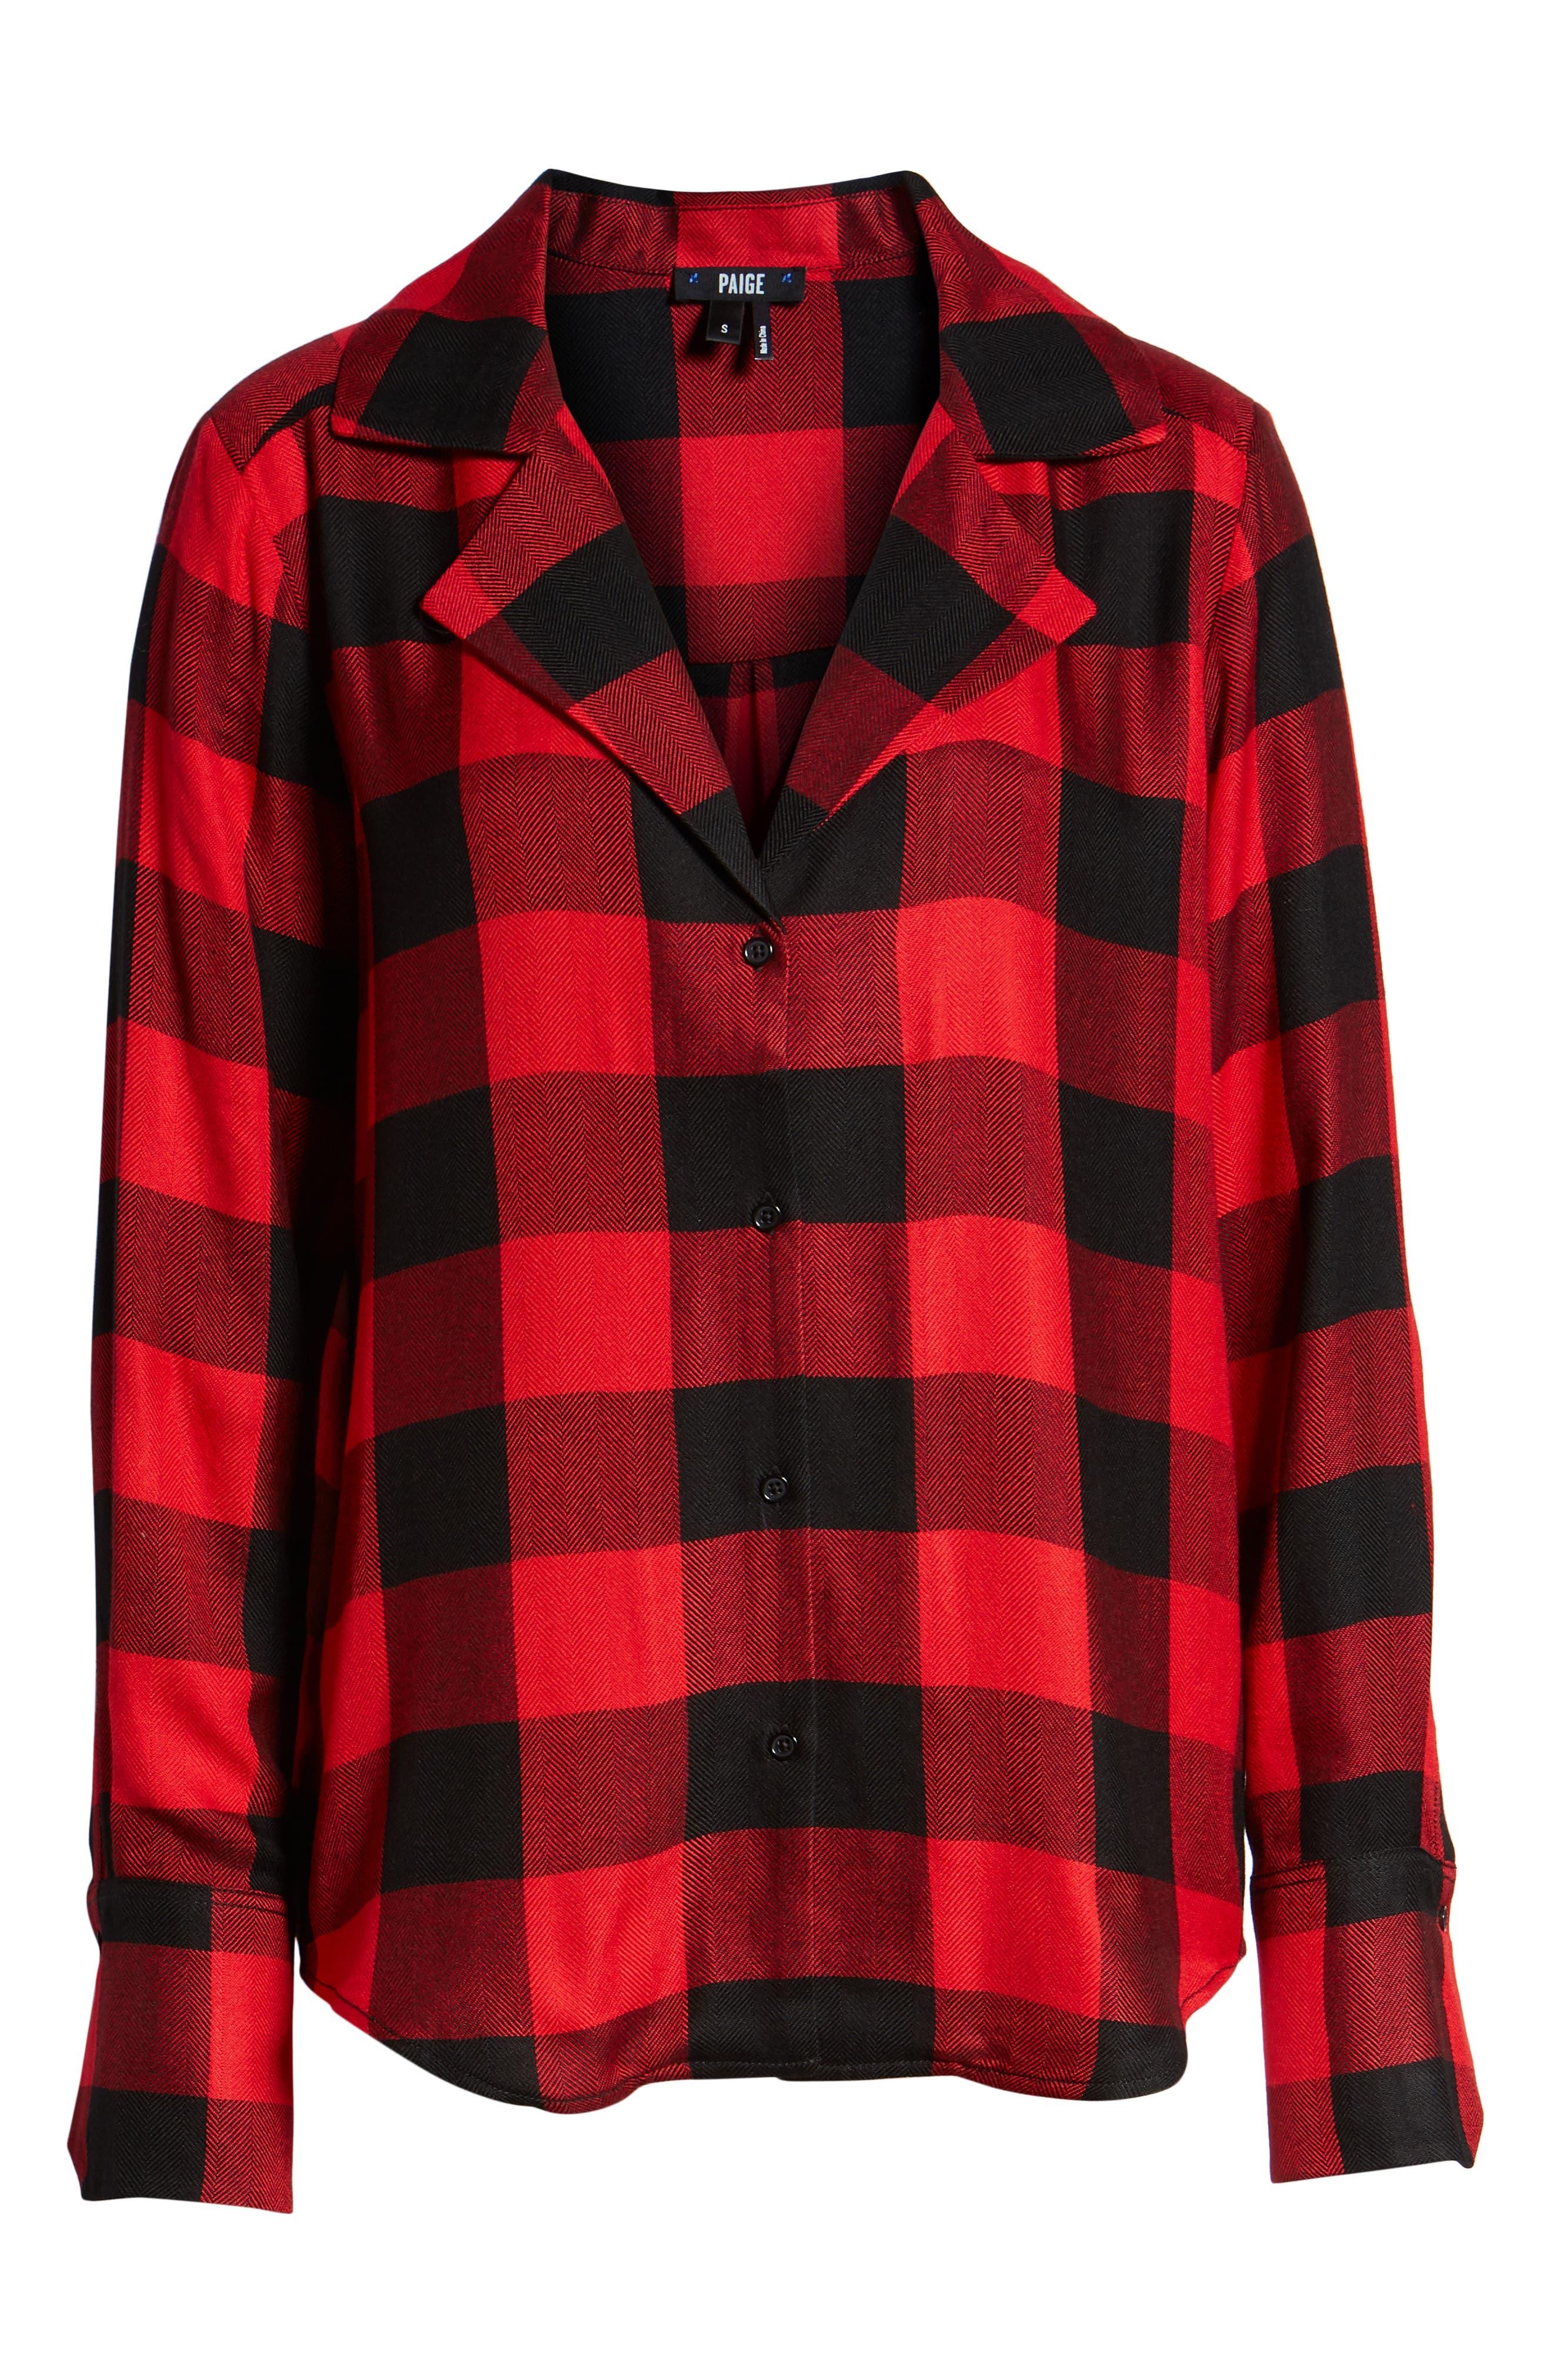 PAIGE,                             Elora Shirt,                             Alternate thumbnail 6, color,                             TRUE RED / BLACK